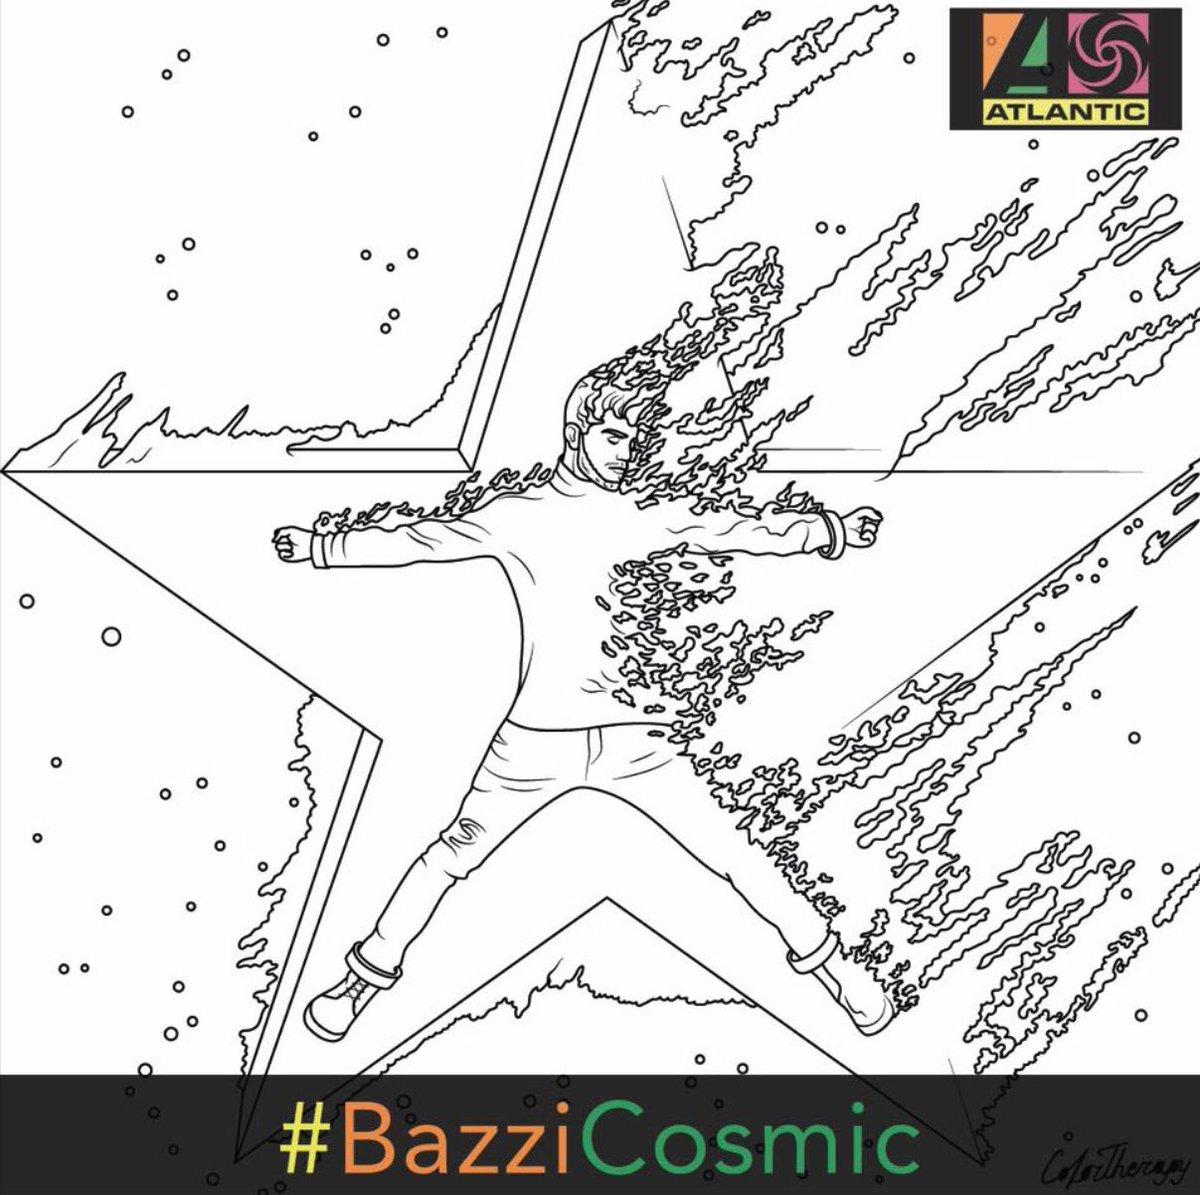 professional sale buy good wholesale bazzicosmic hashtag on Twitter